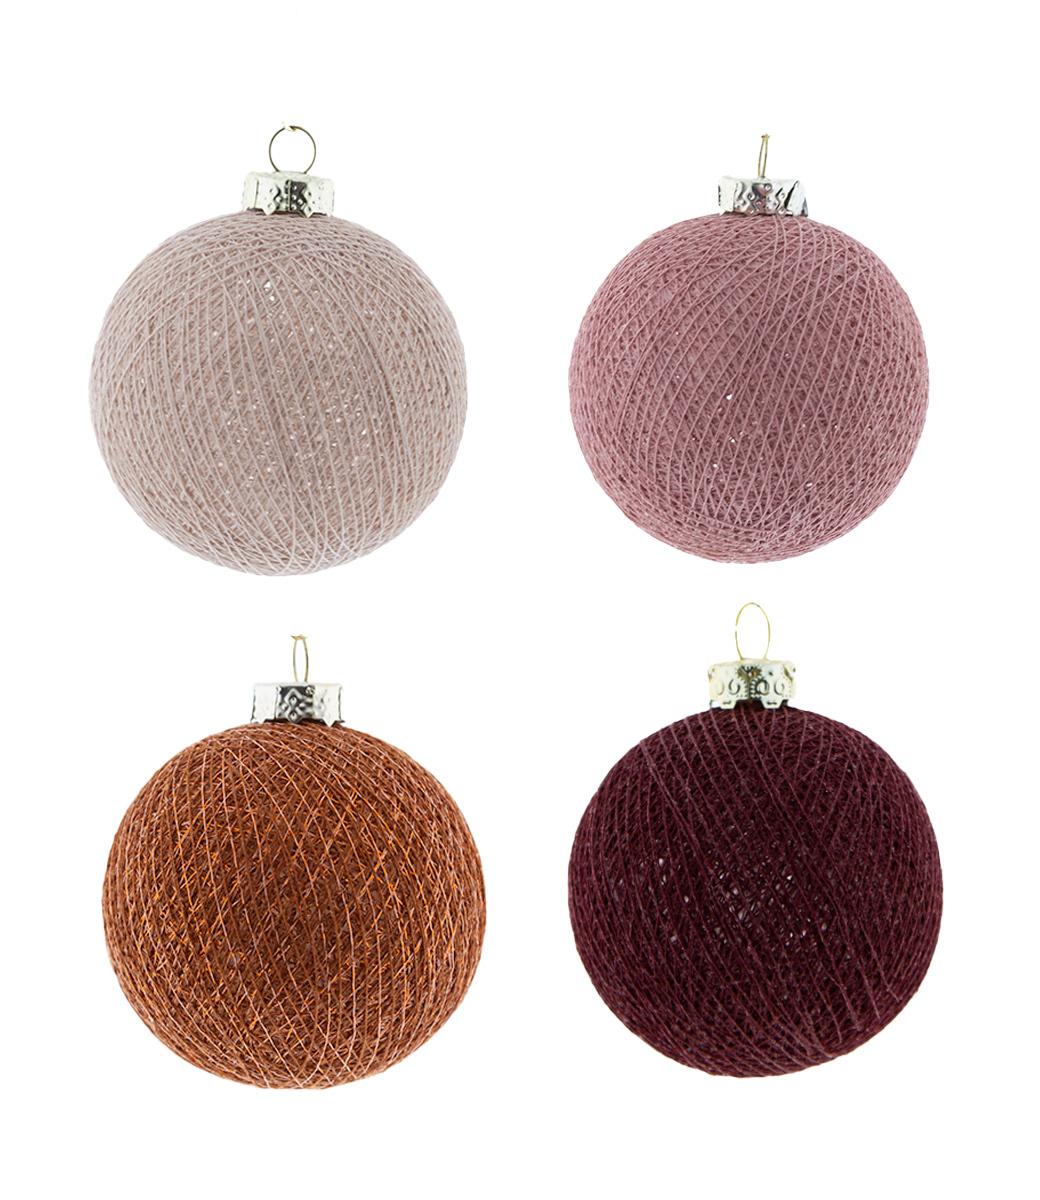 Kerstmis Cotton Balls - Bohemian Spice